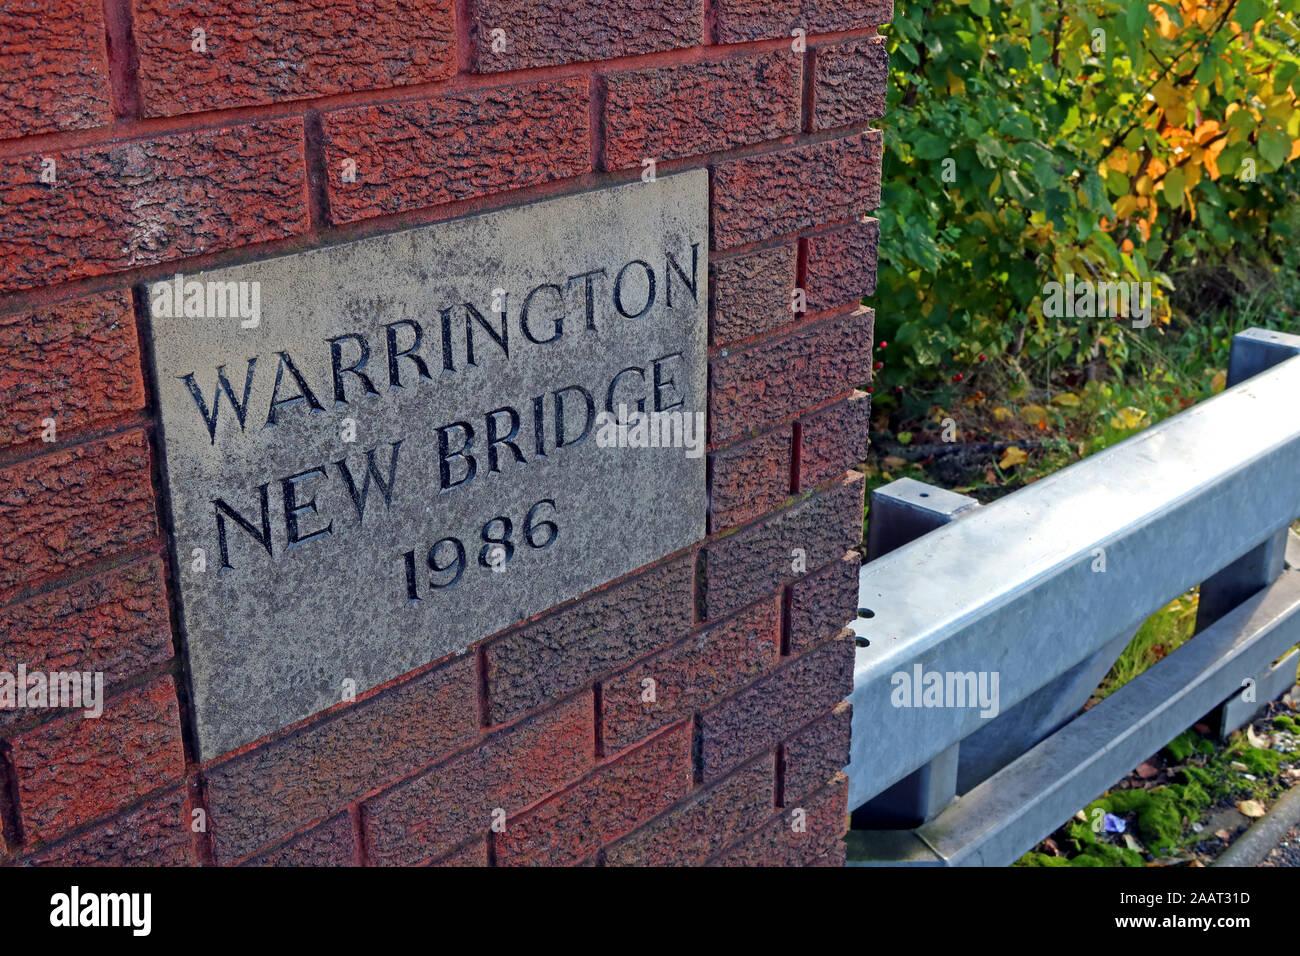 HotpixUk,@HotpixUK,GoTonySmith,UK,England,English,Mersey,at,bridges,crossing,flood,flooding,October 2019,autumn,full moon,lunar,tides,tide,Environmental Agency,flood defenses,River Mersey Crossing,pano,panorama,Cheshire,WA1 1WA,WA1,North West,Bridge Foot,Warrington Bridge,sign,Warrington New Bridge 1986,Warrington New Bridge,1986